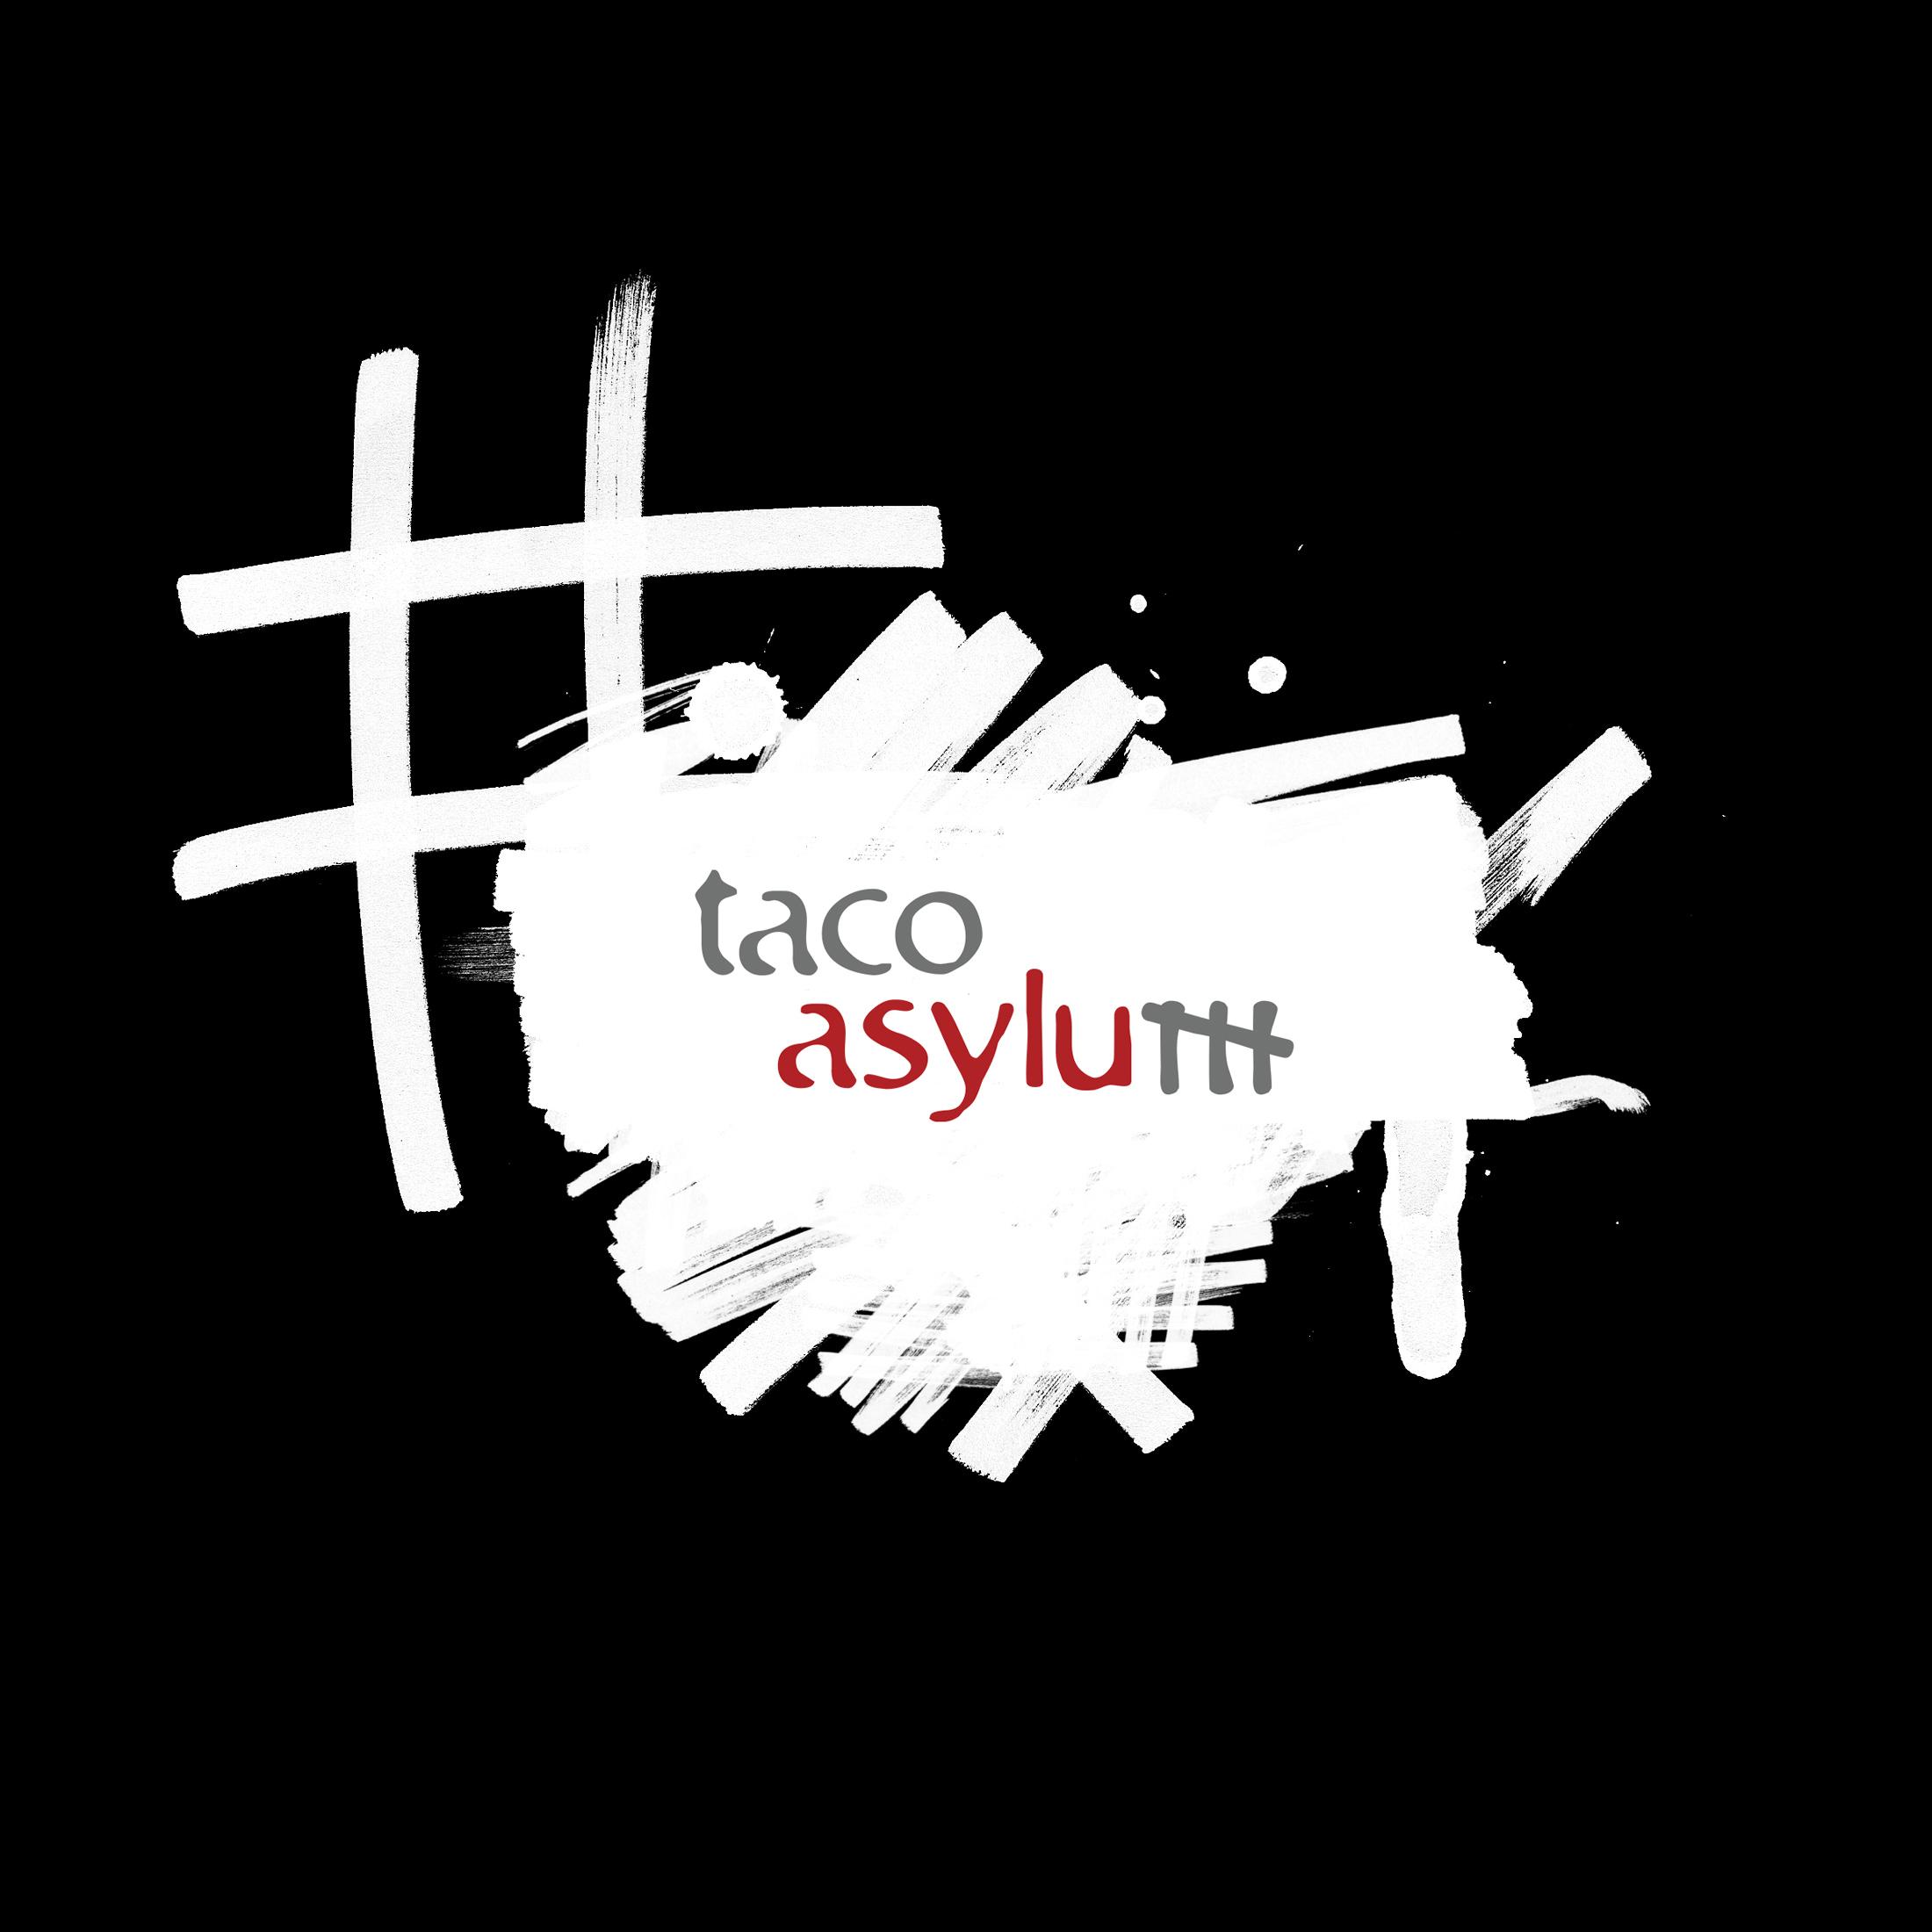 Taco Asylum